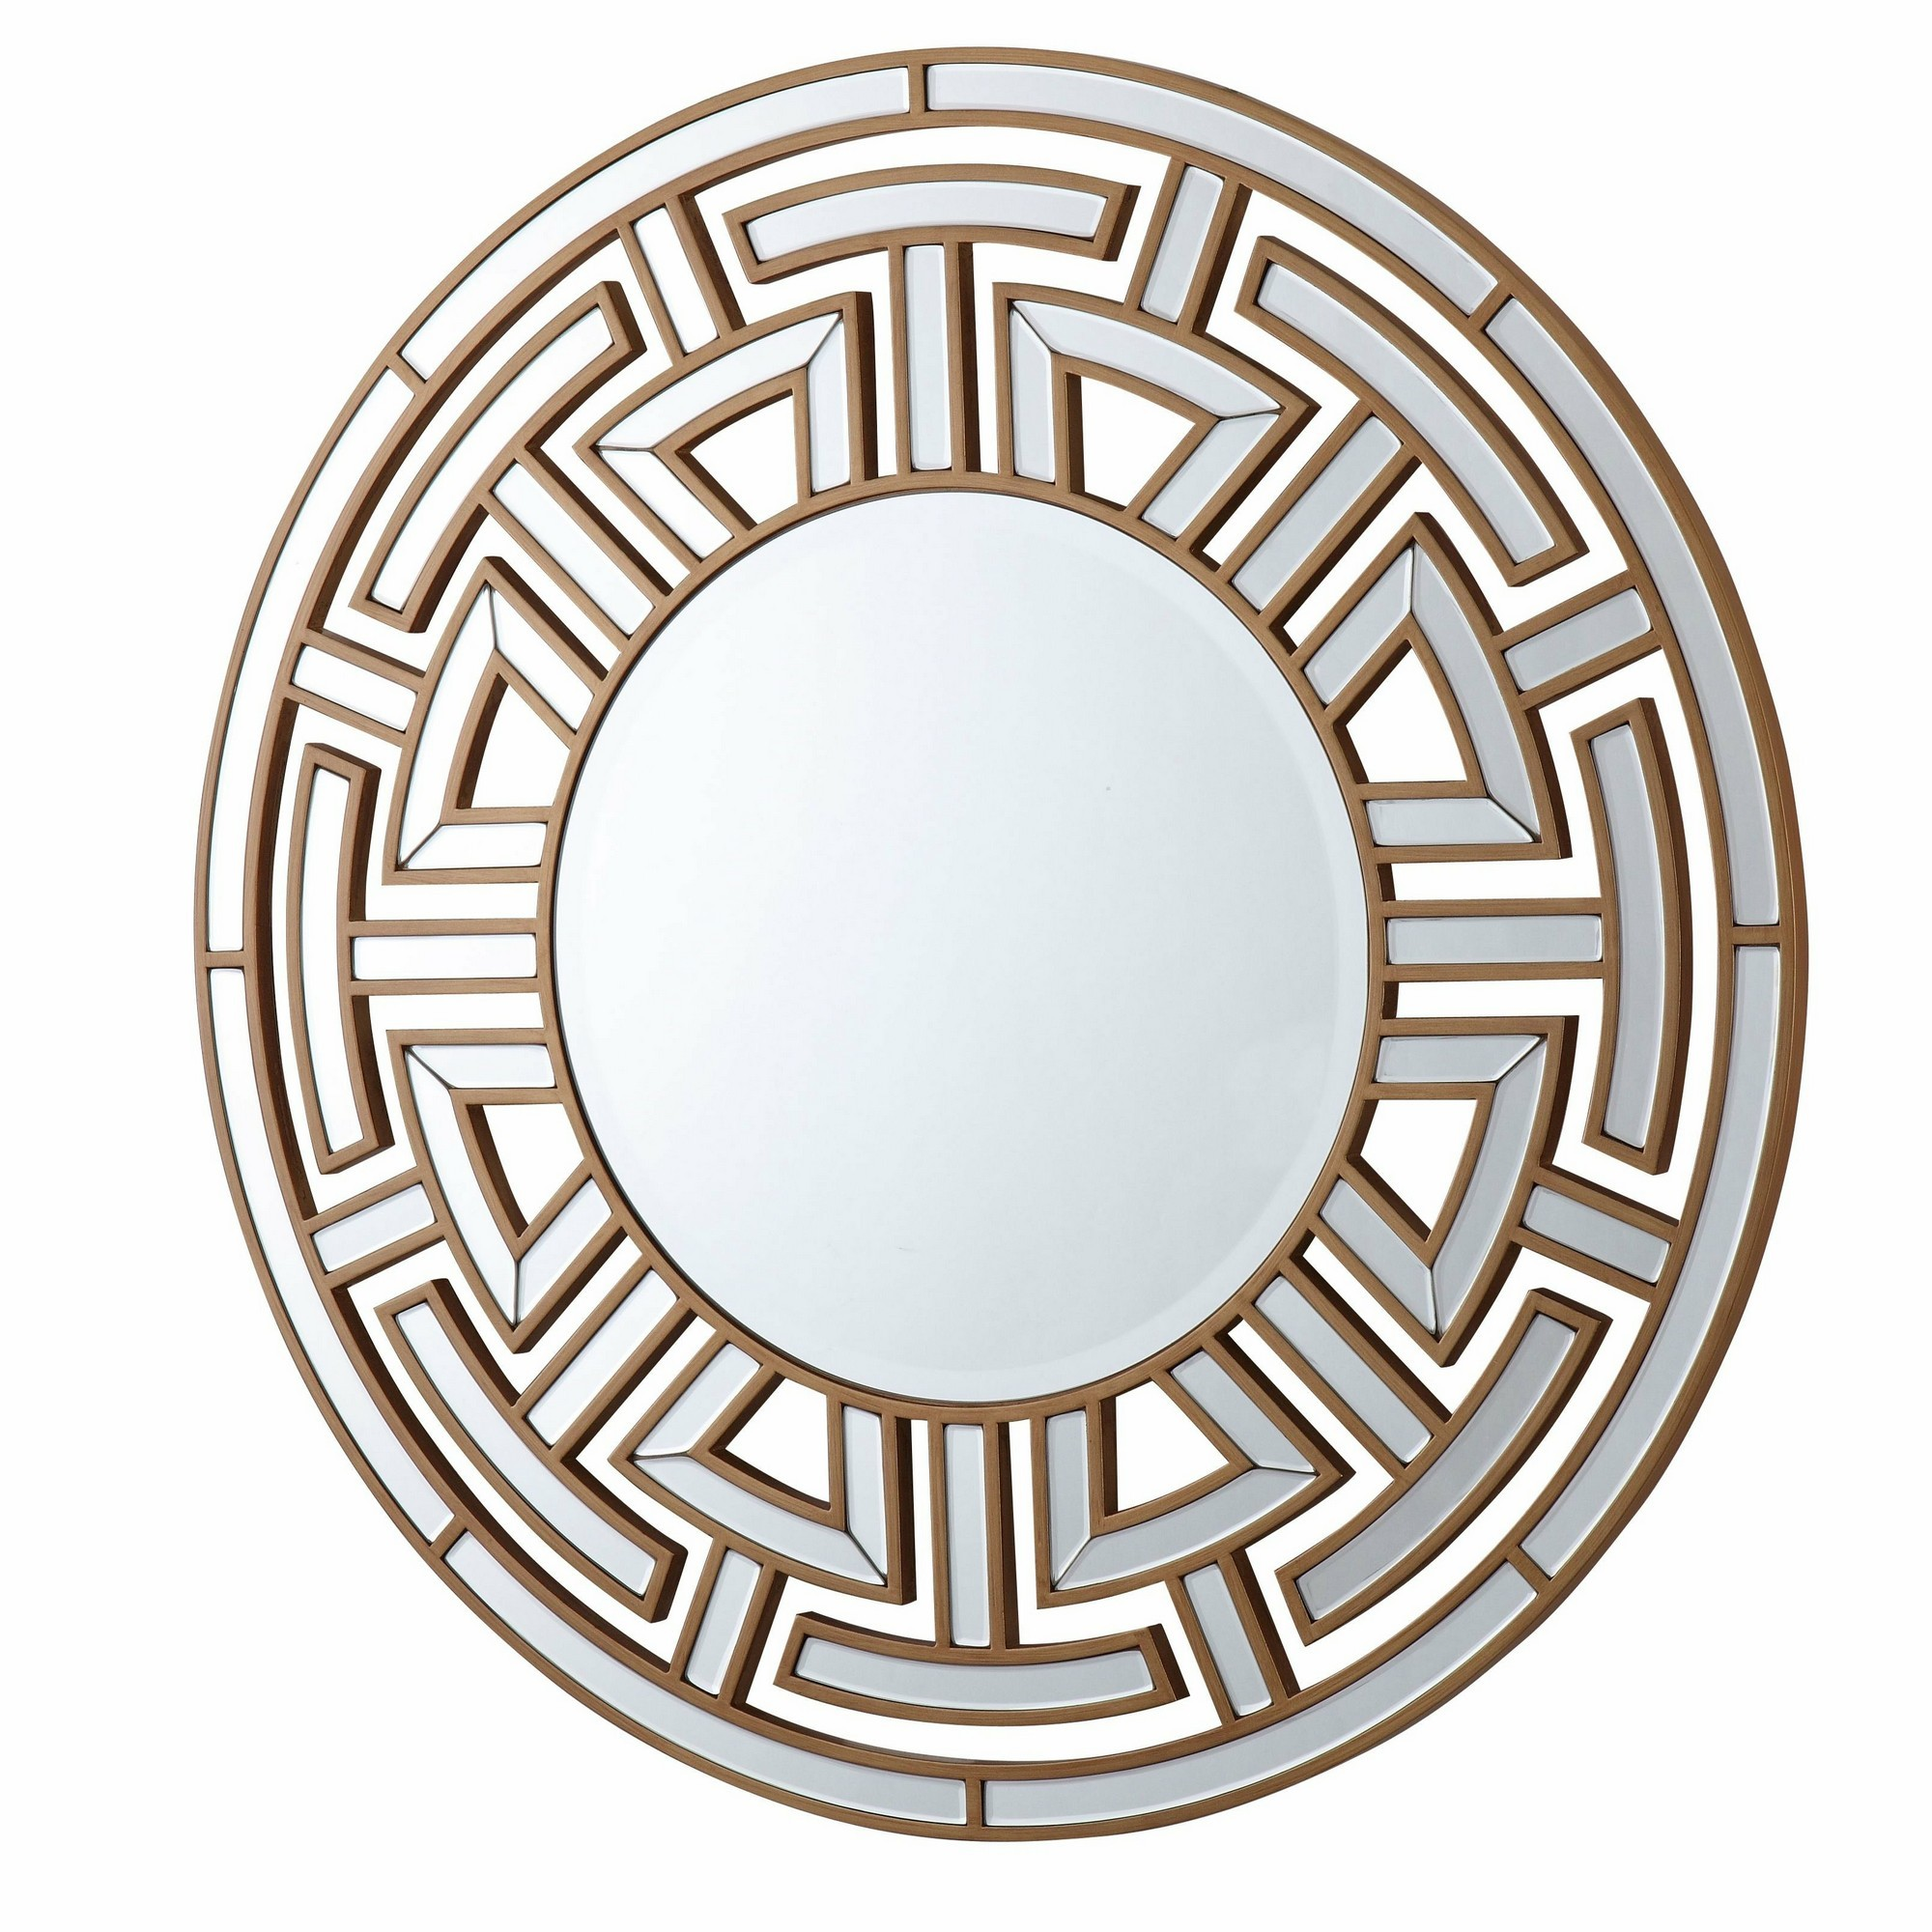 Tertenia Round Wall Mirror, 100cm